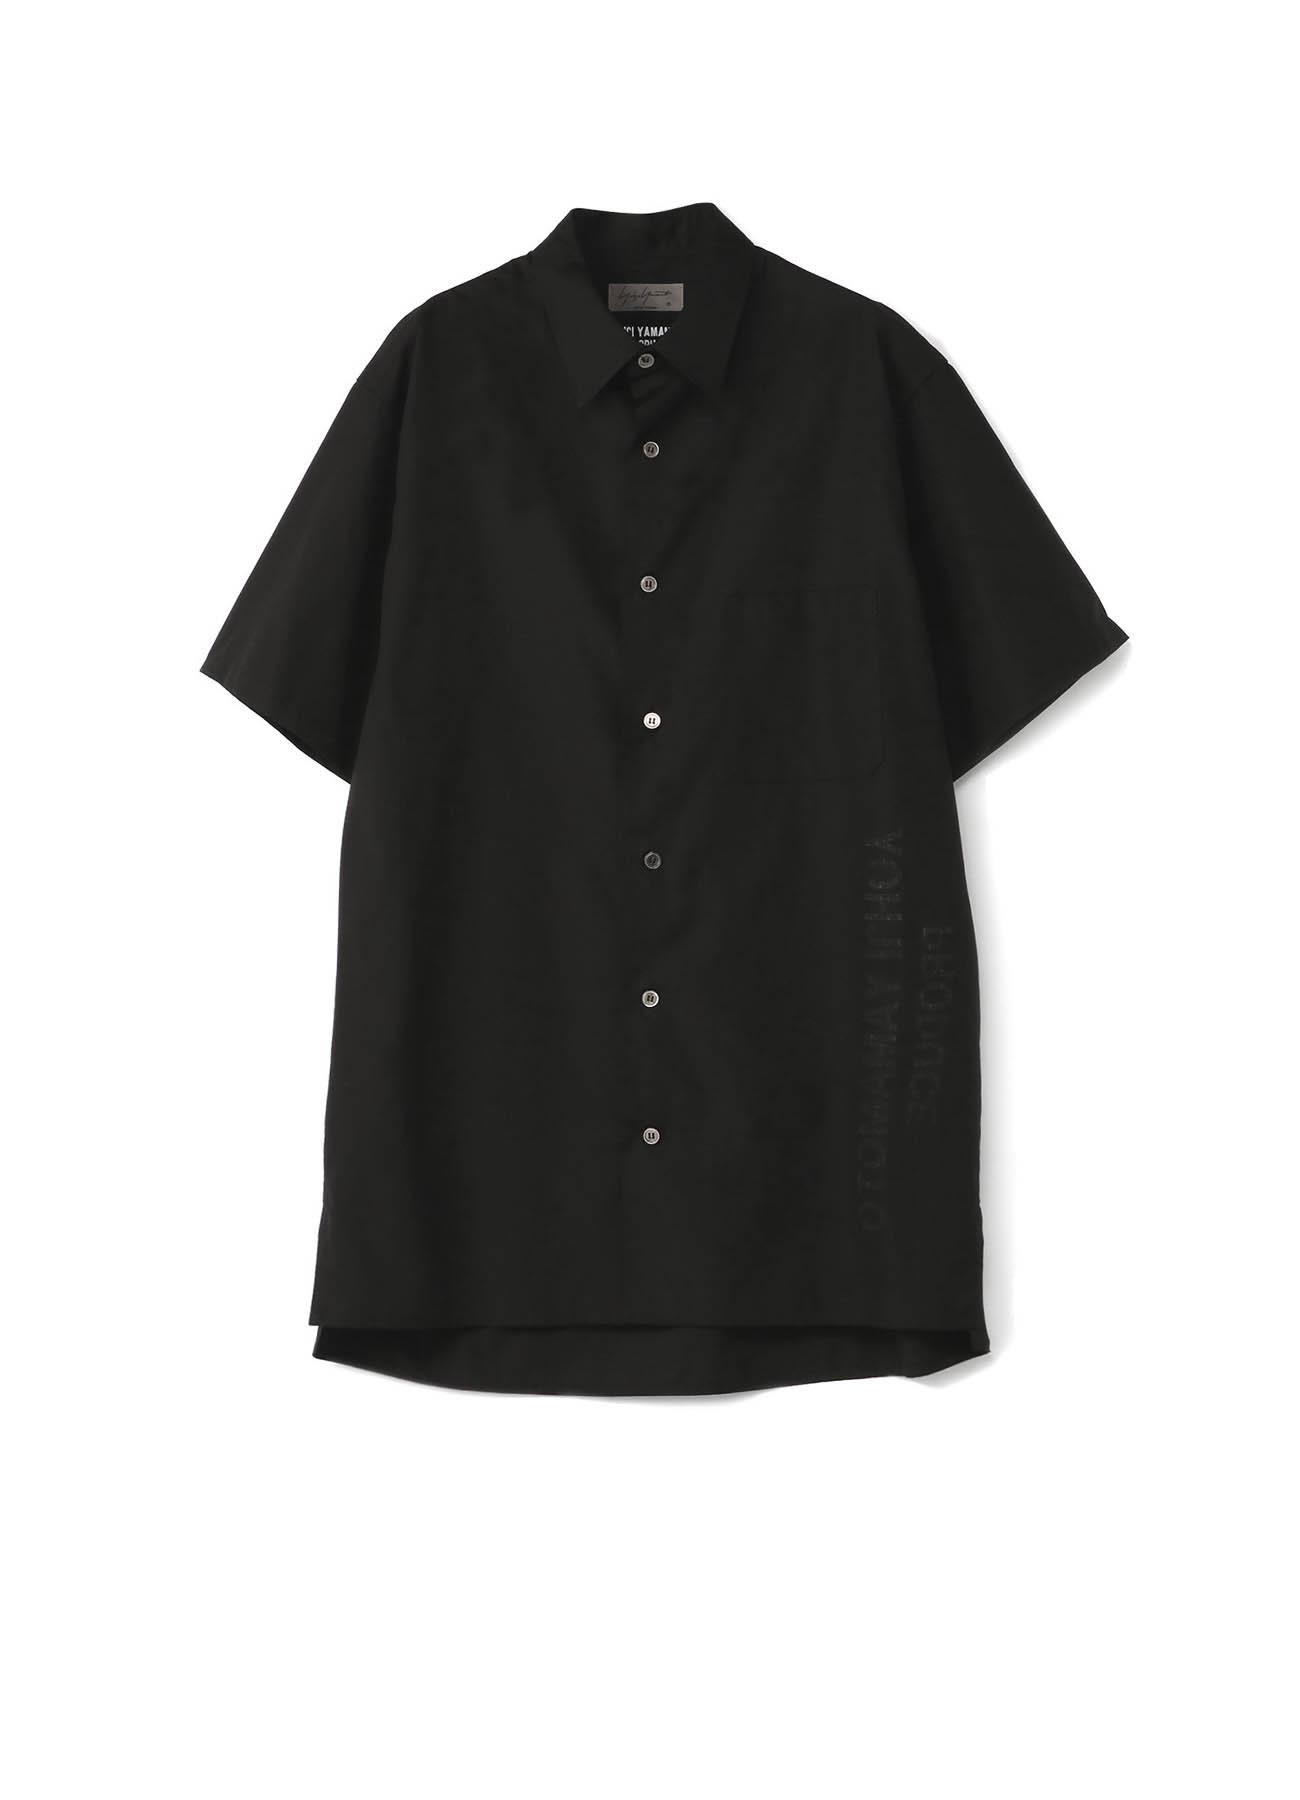 【THE SHOP限定】细平纹短袖衬衫